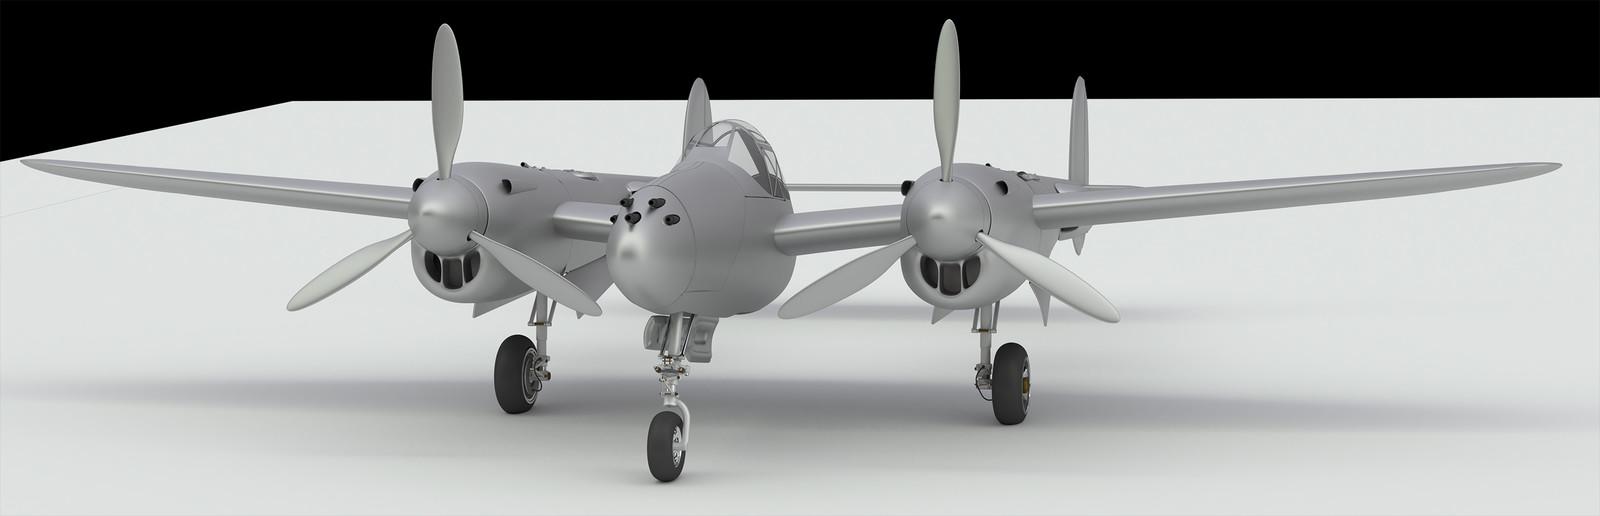 P-38 study